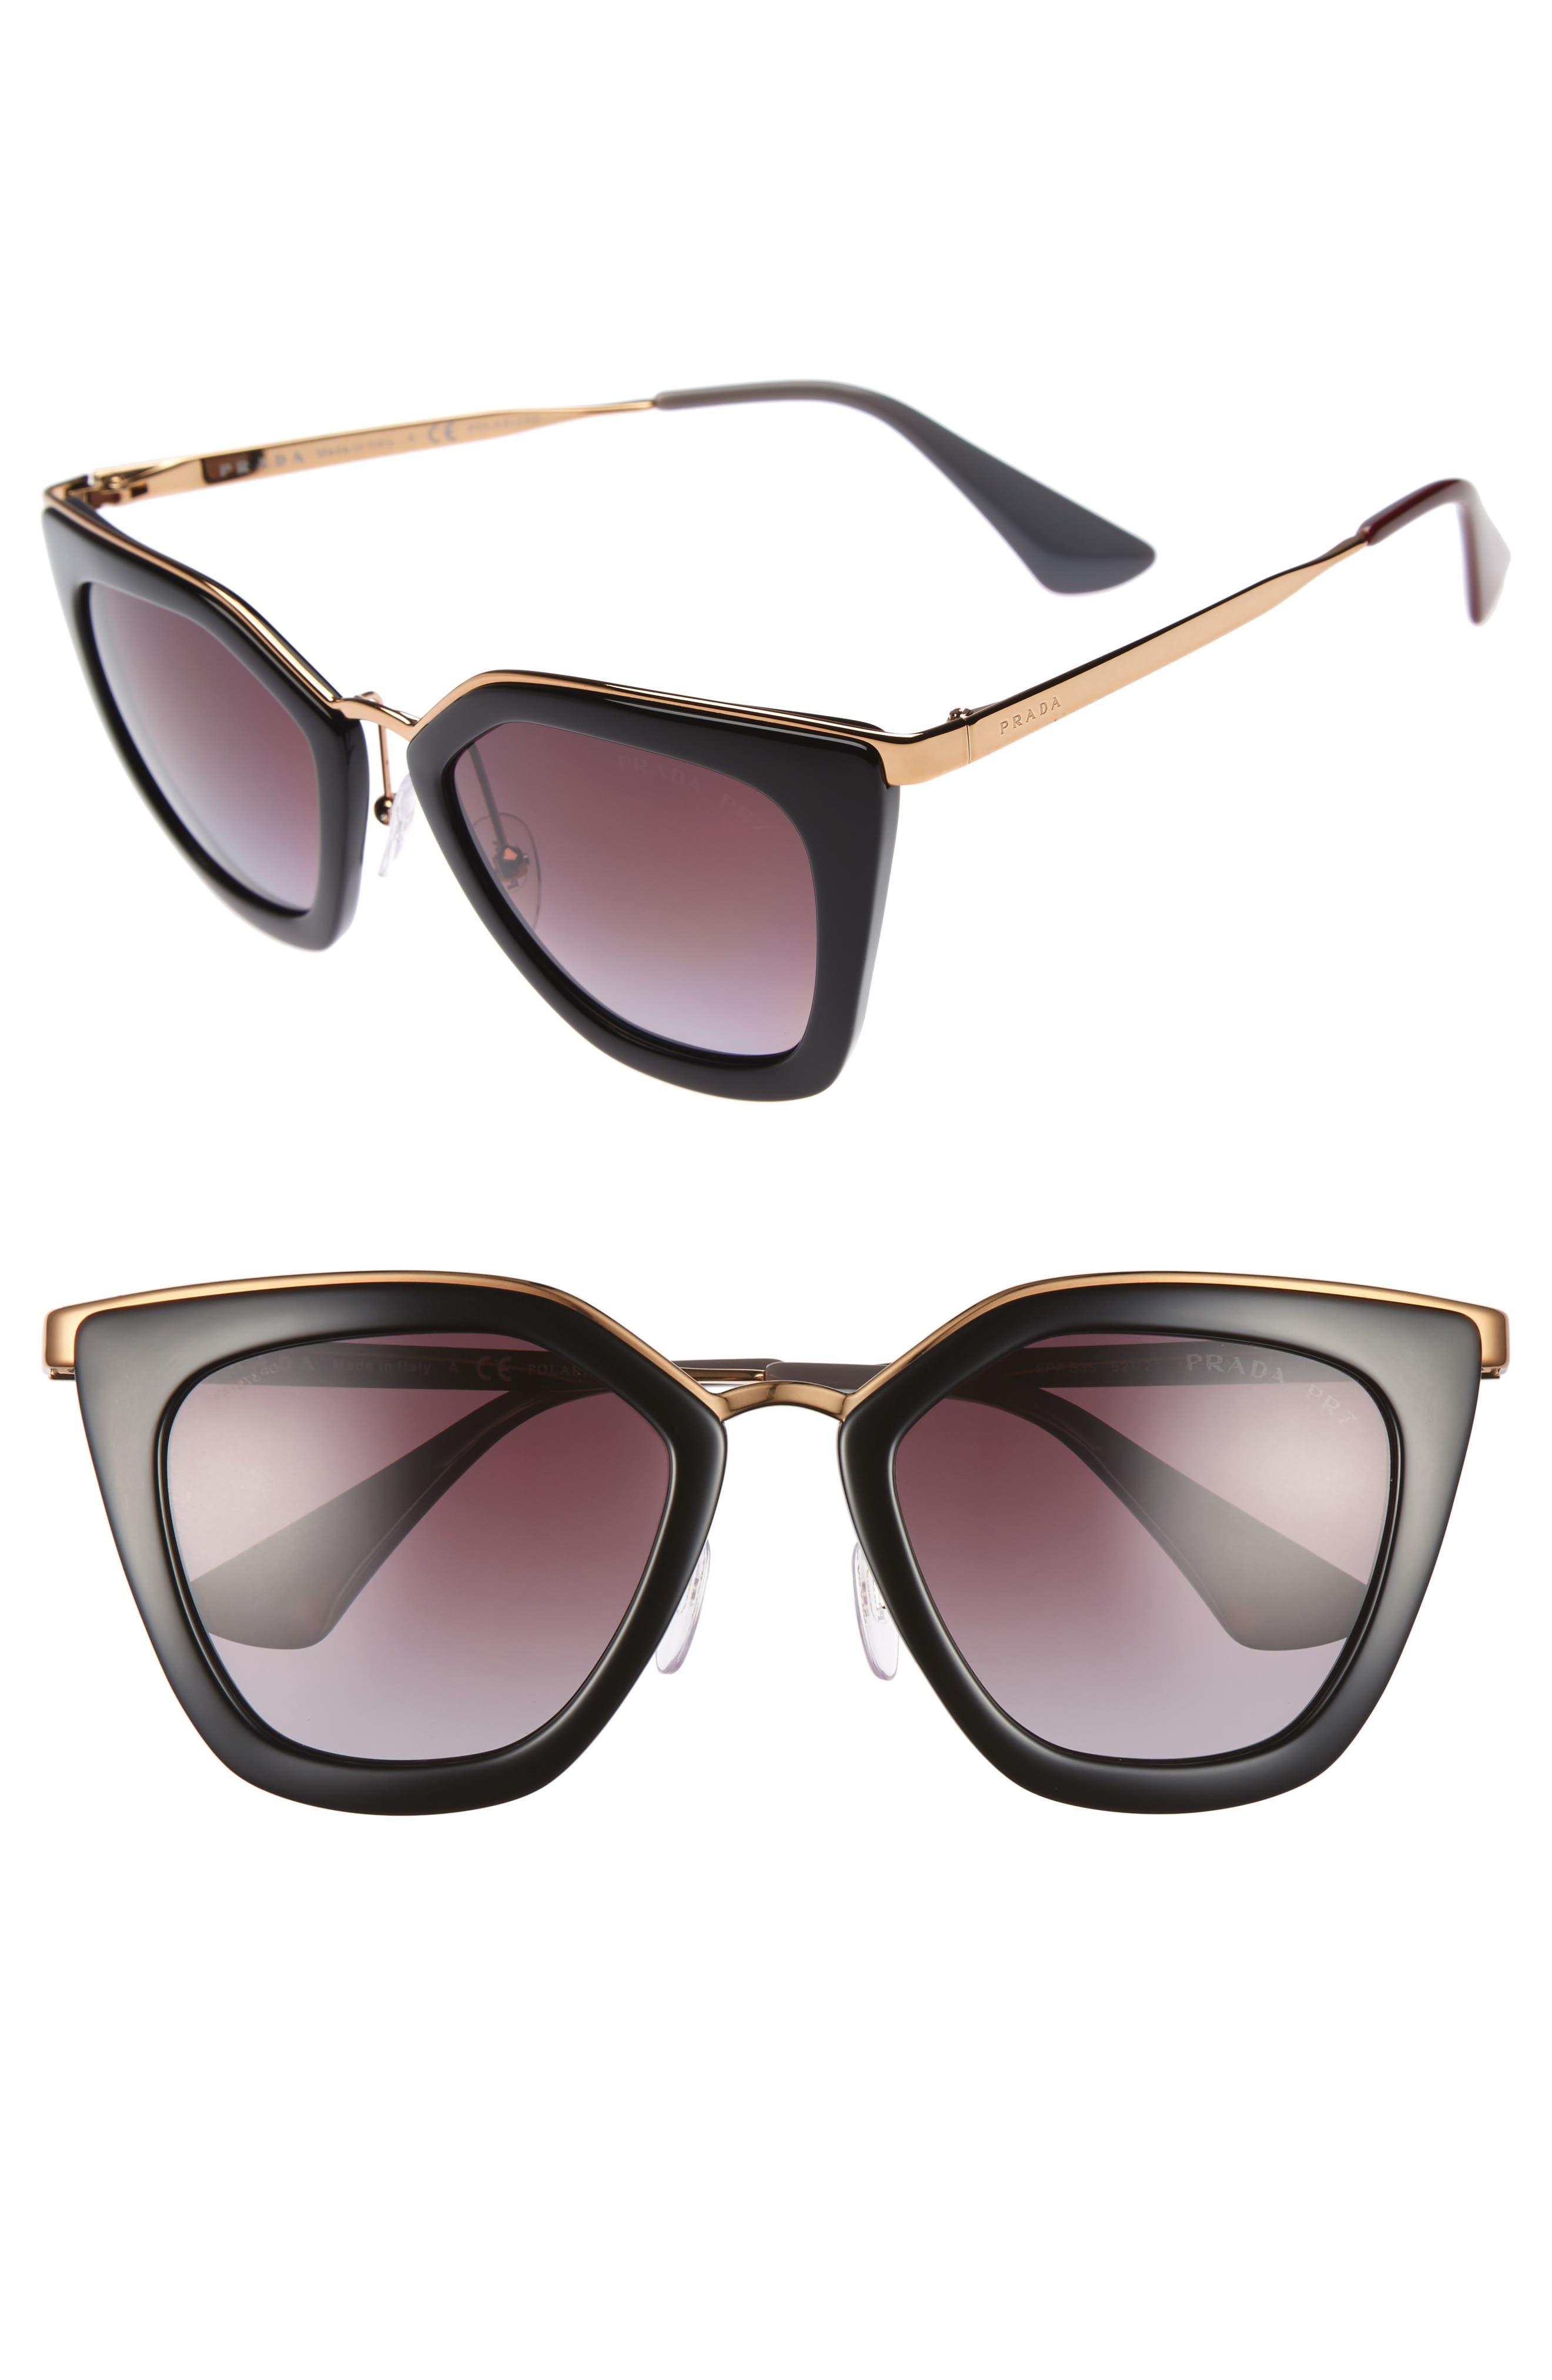 52mm Polarized Cat Eye Sunglasses,                             Main thumbnail 1, color,                             001